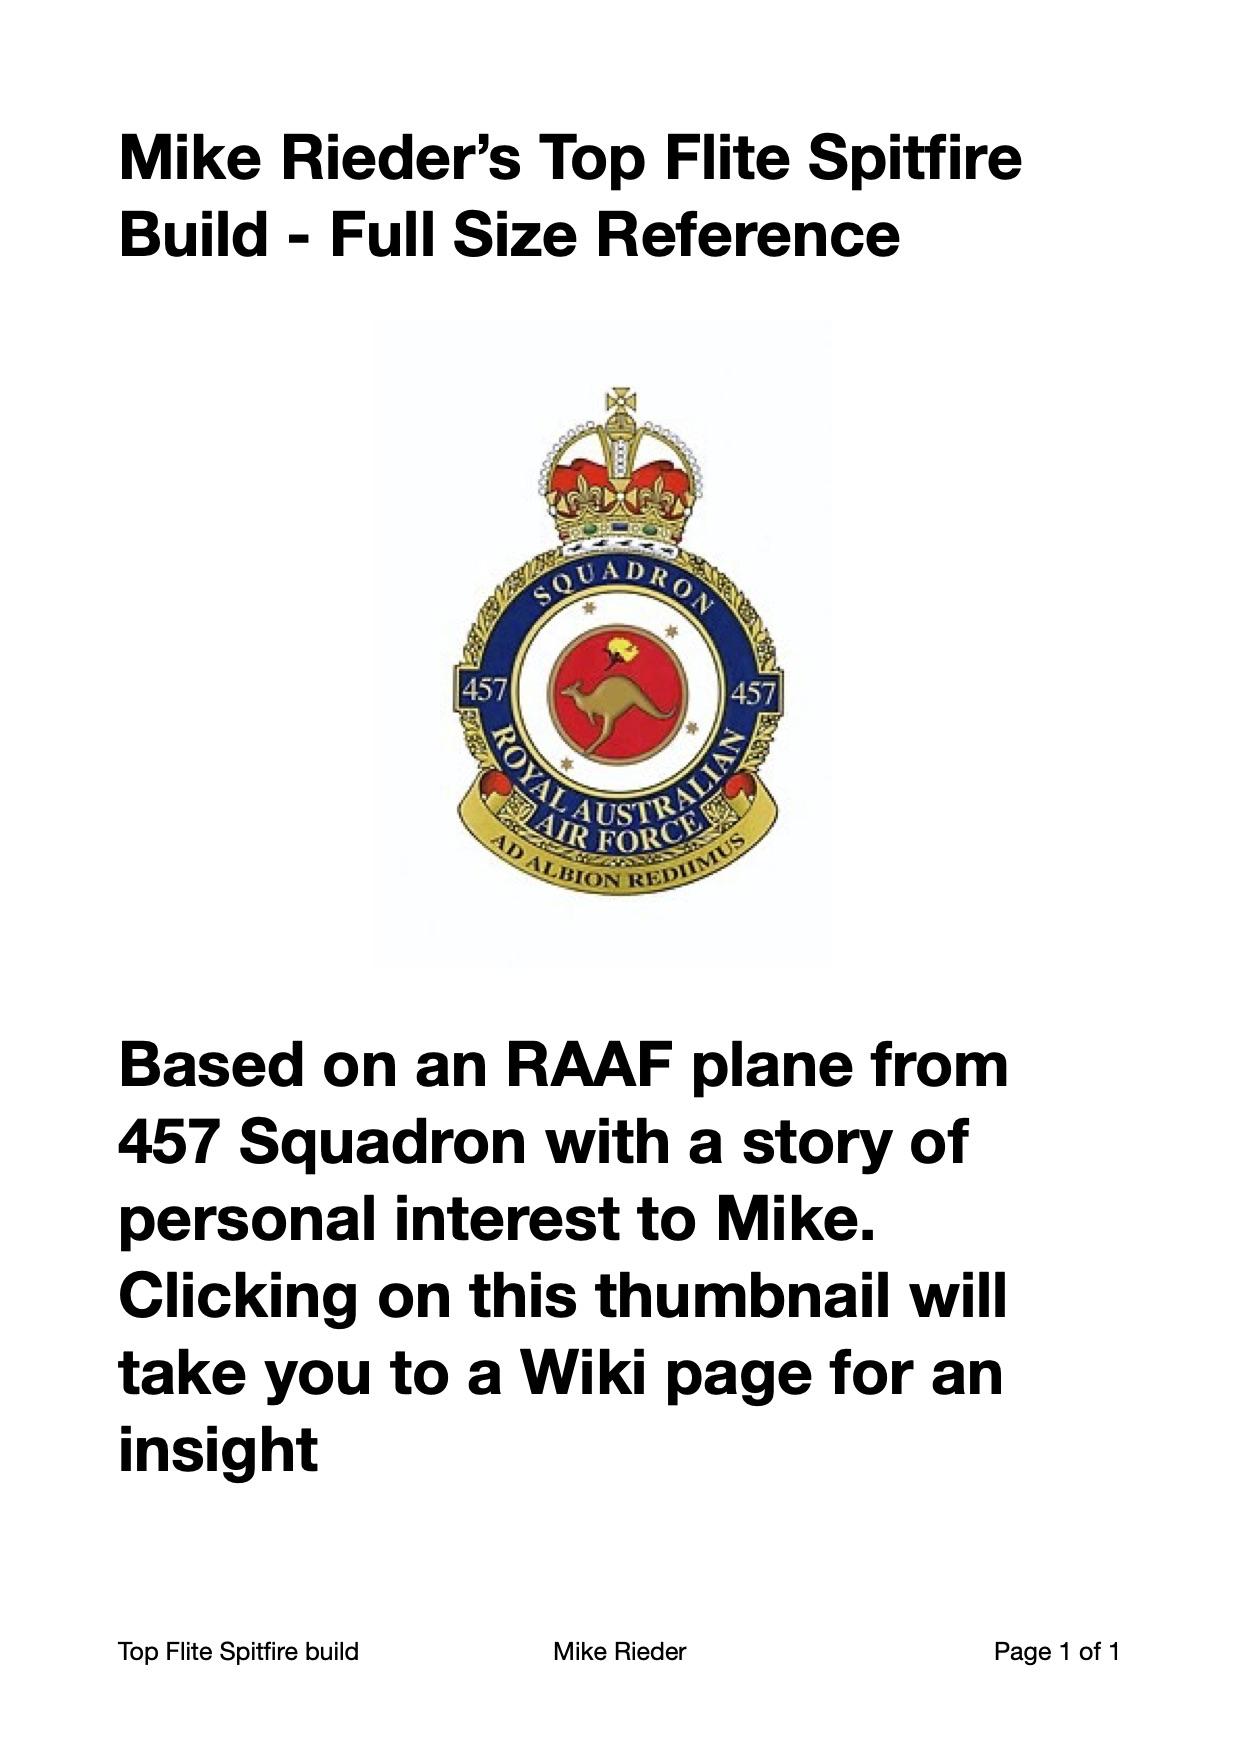 Mike Rieder Spitfire 457 Squadron RAAF insignia